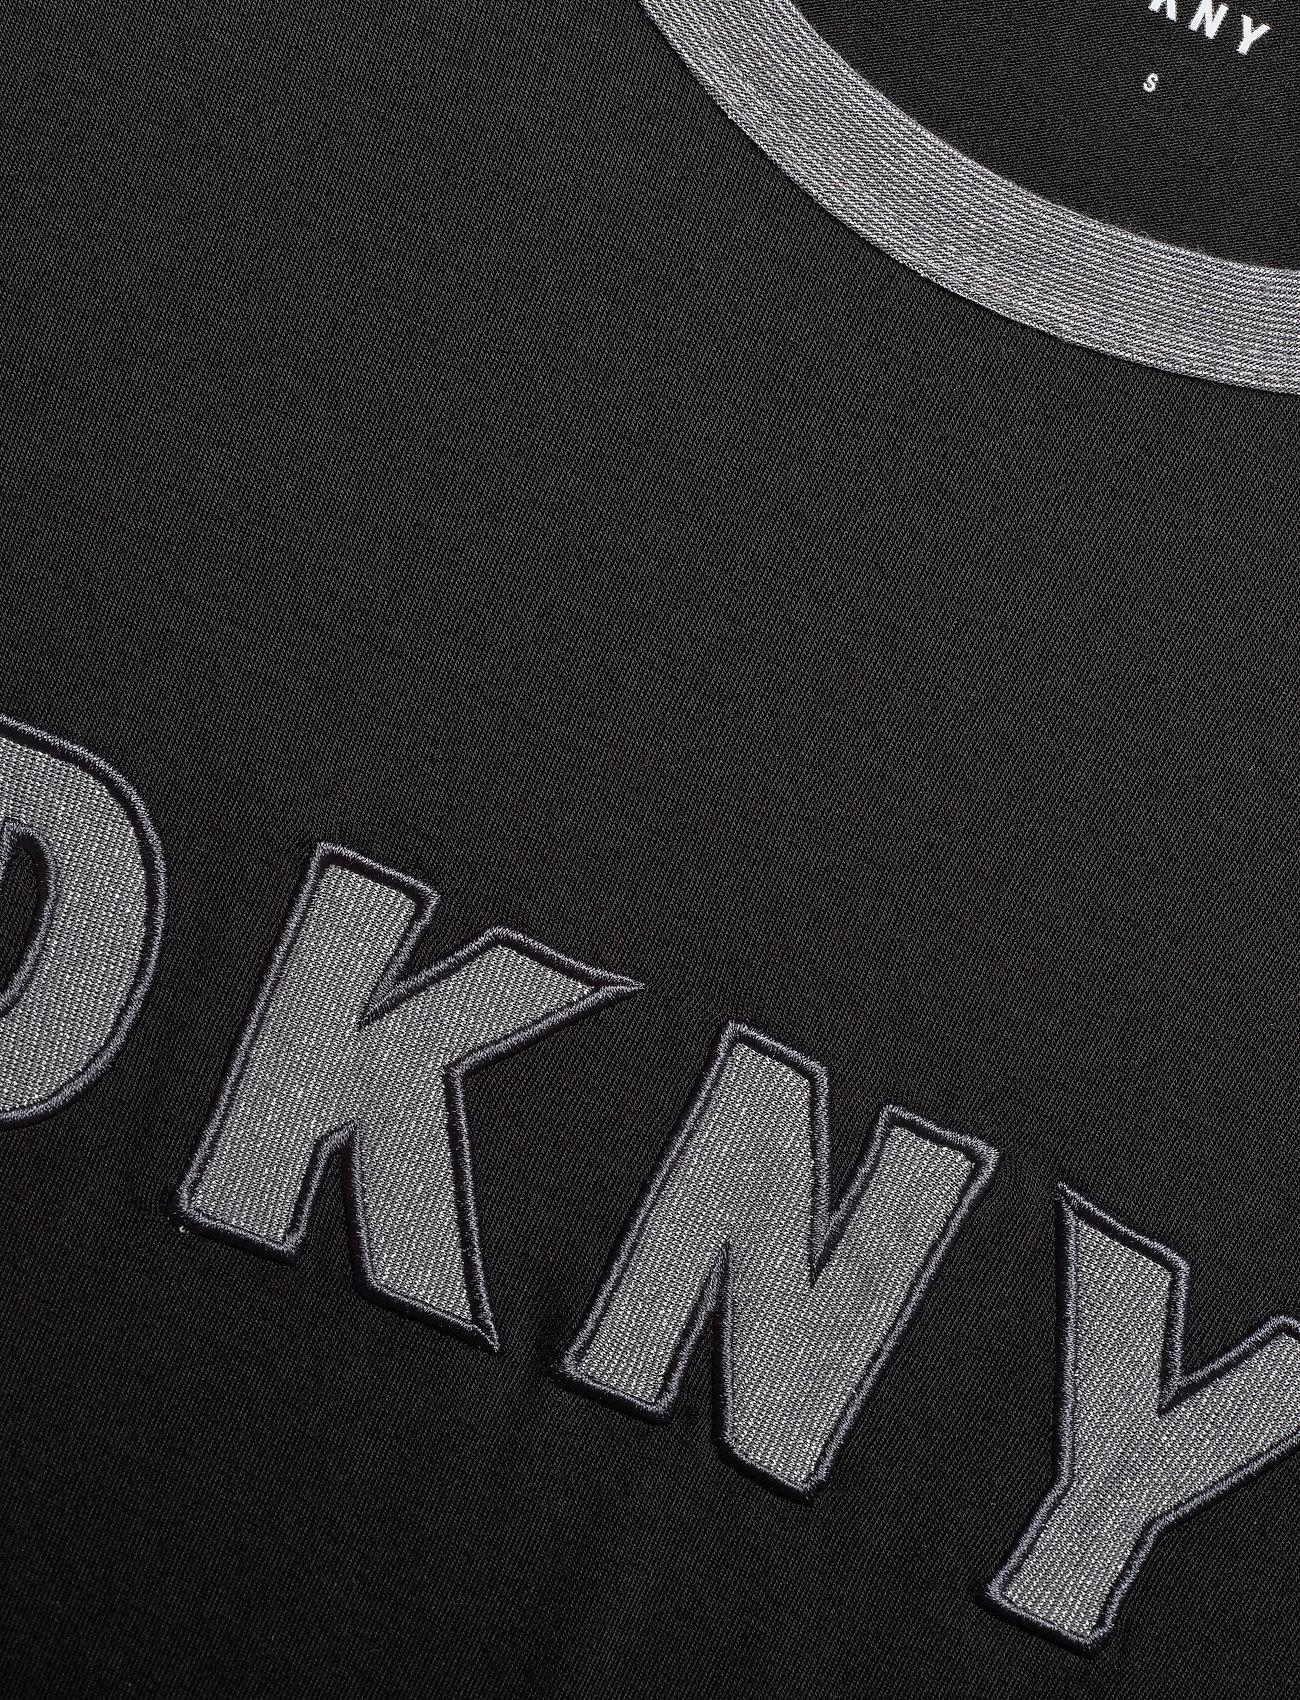 Dkny Homewear Mixed Threads Top L/s - T-shirts & Toppar Black